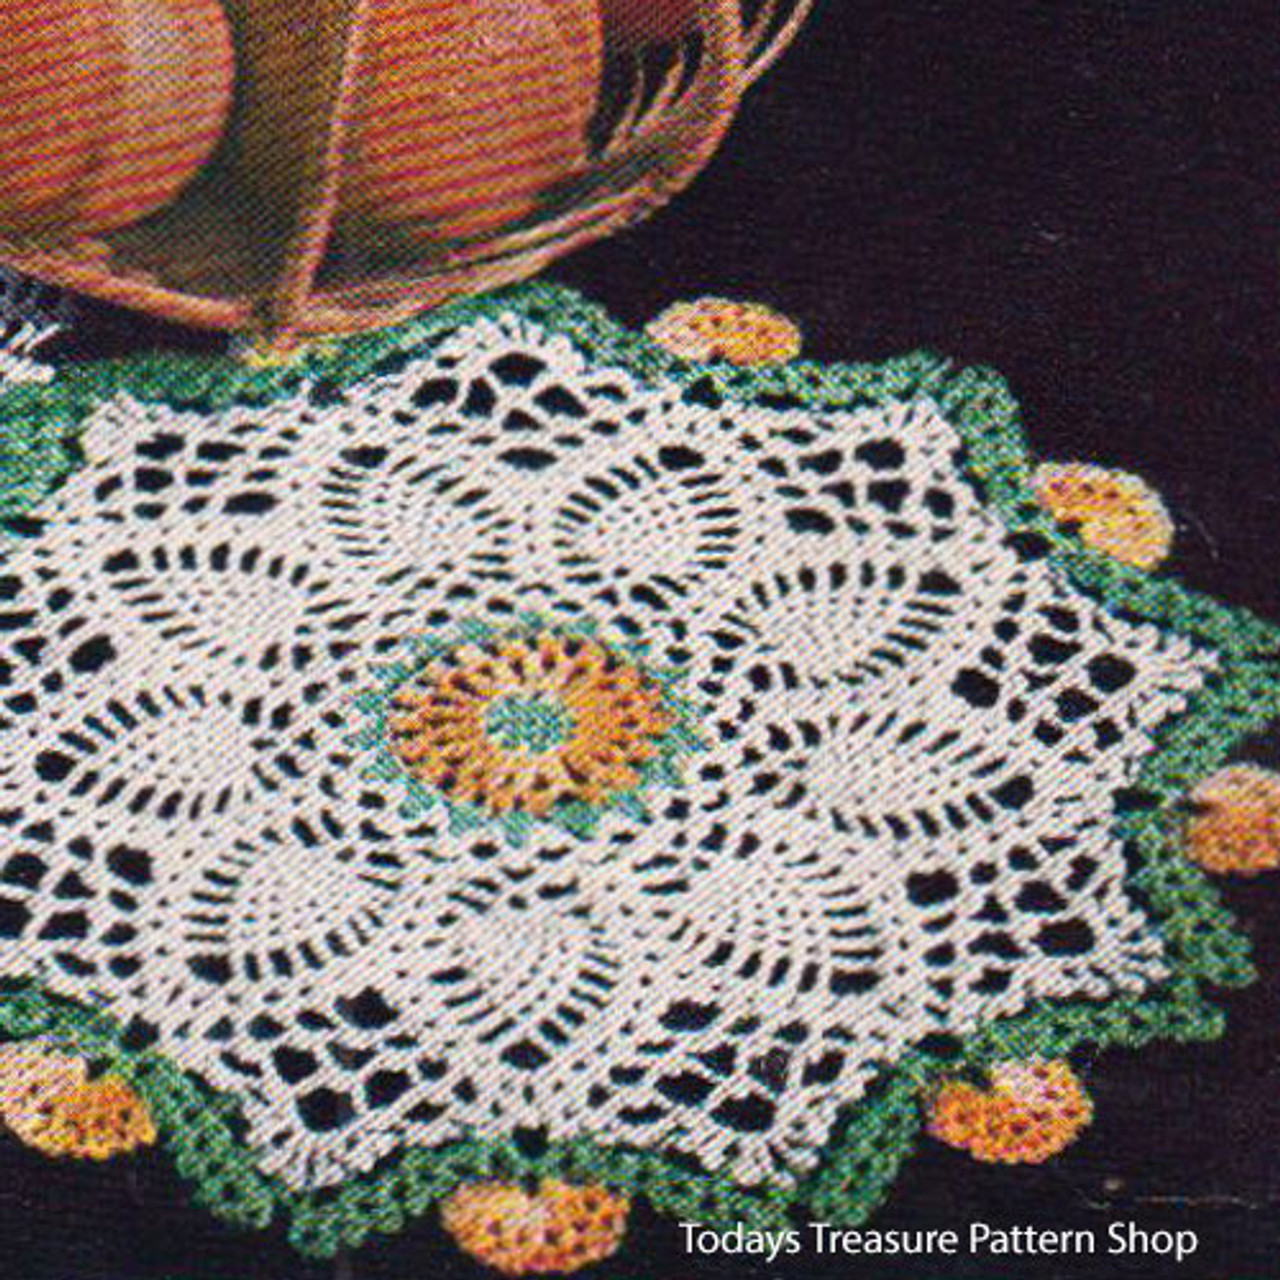 Vintage Marigold Doily Crochet Pattern from American Thread